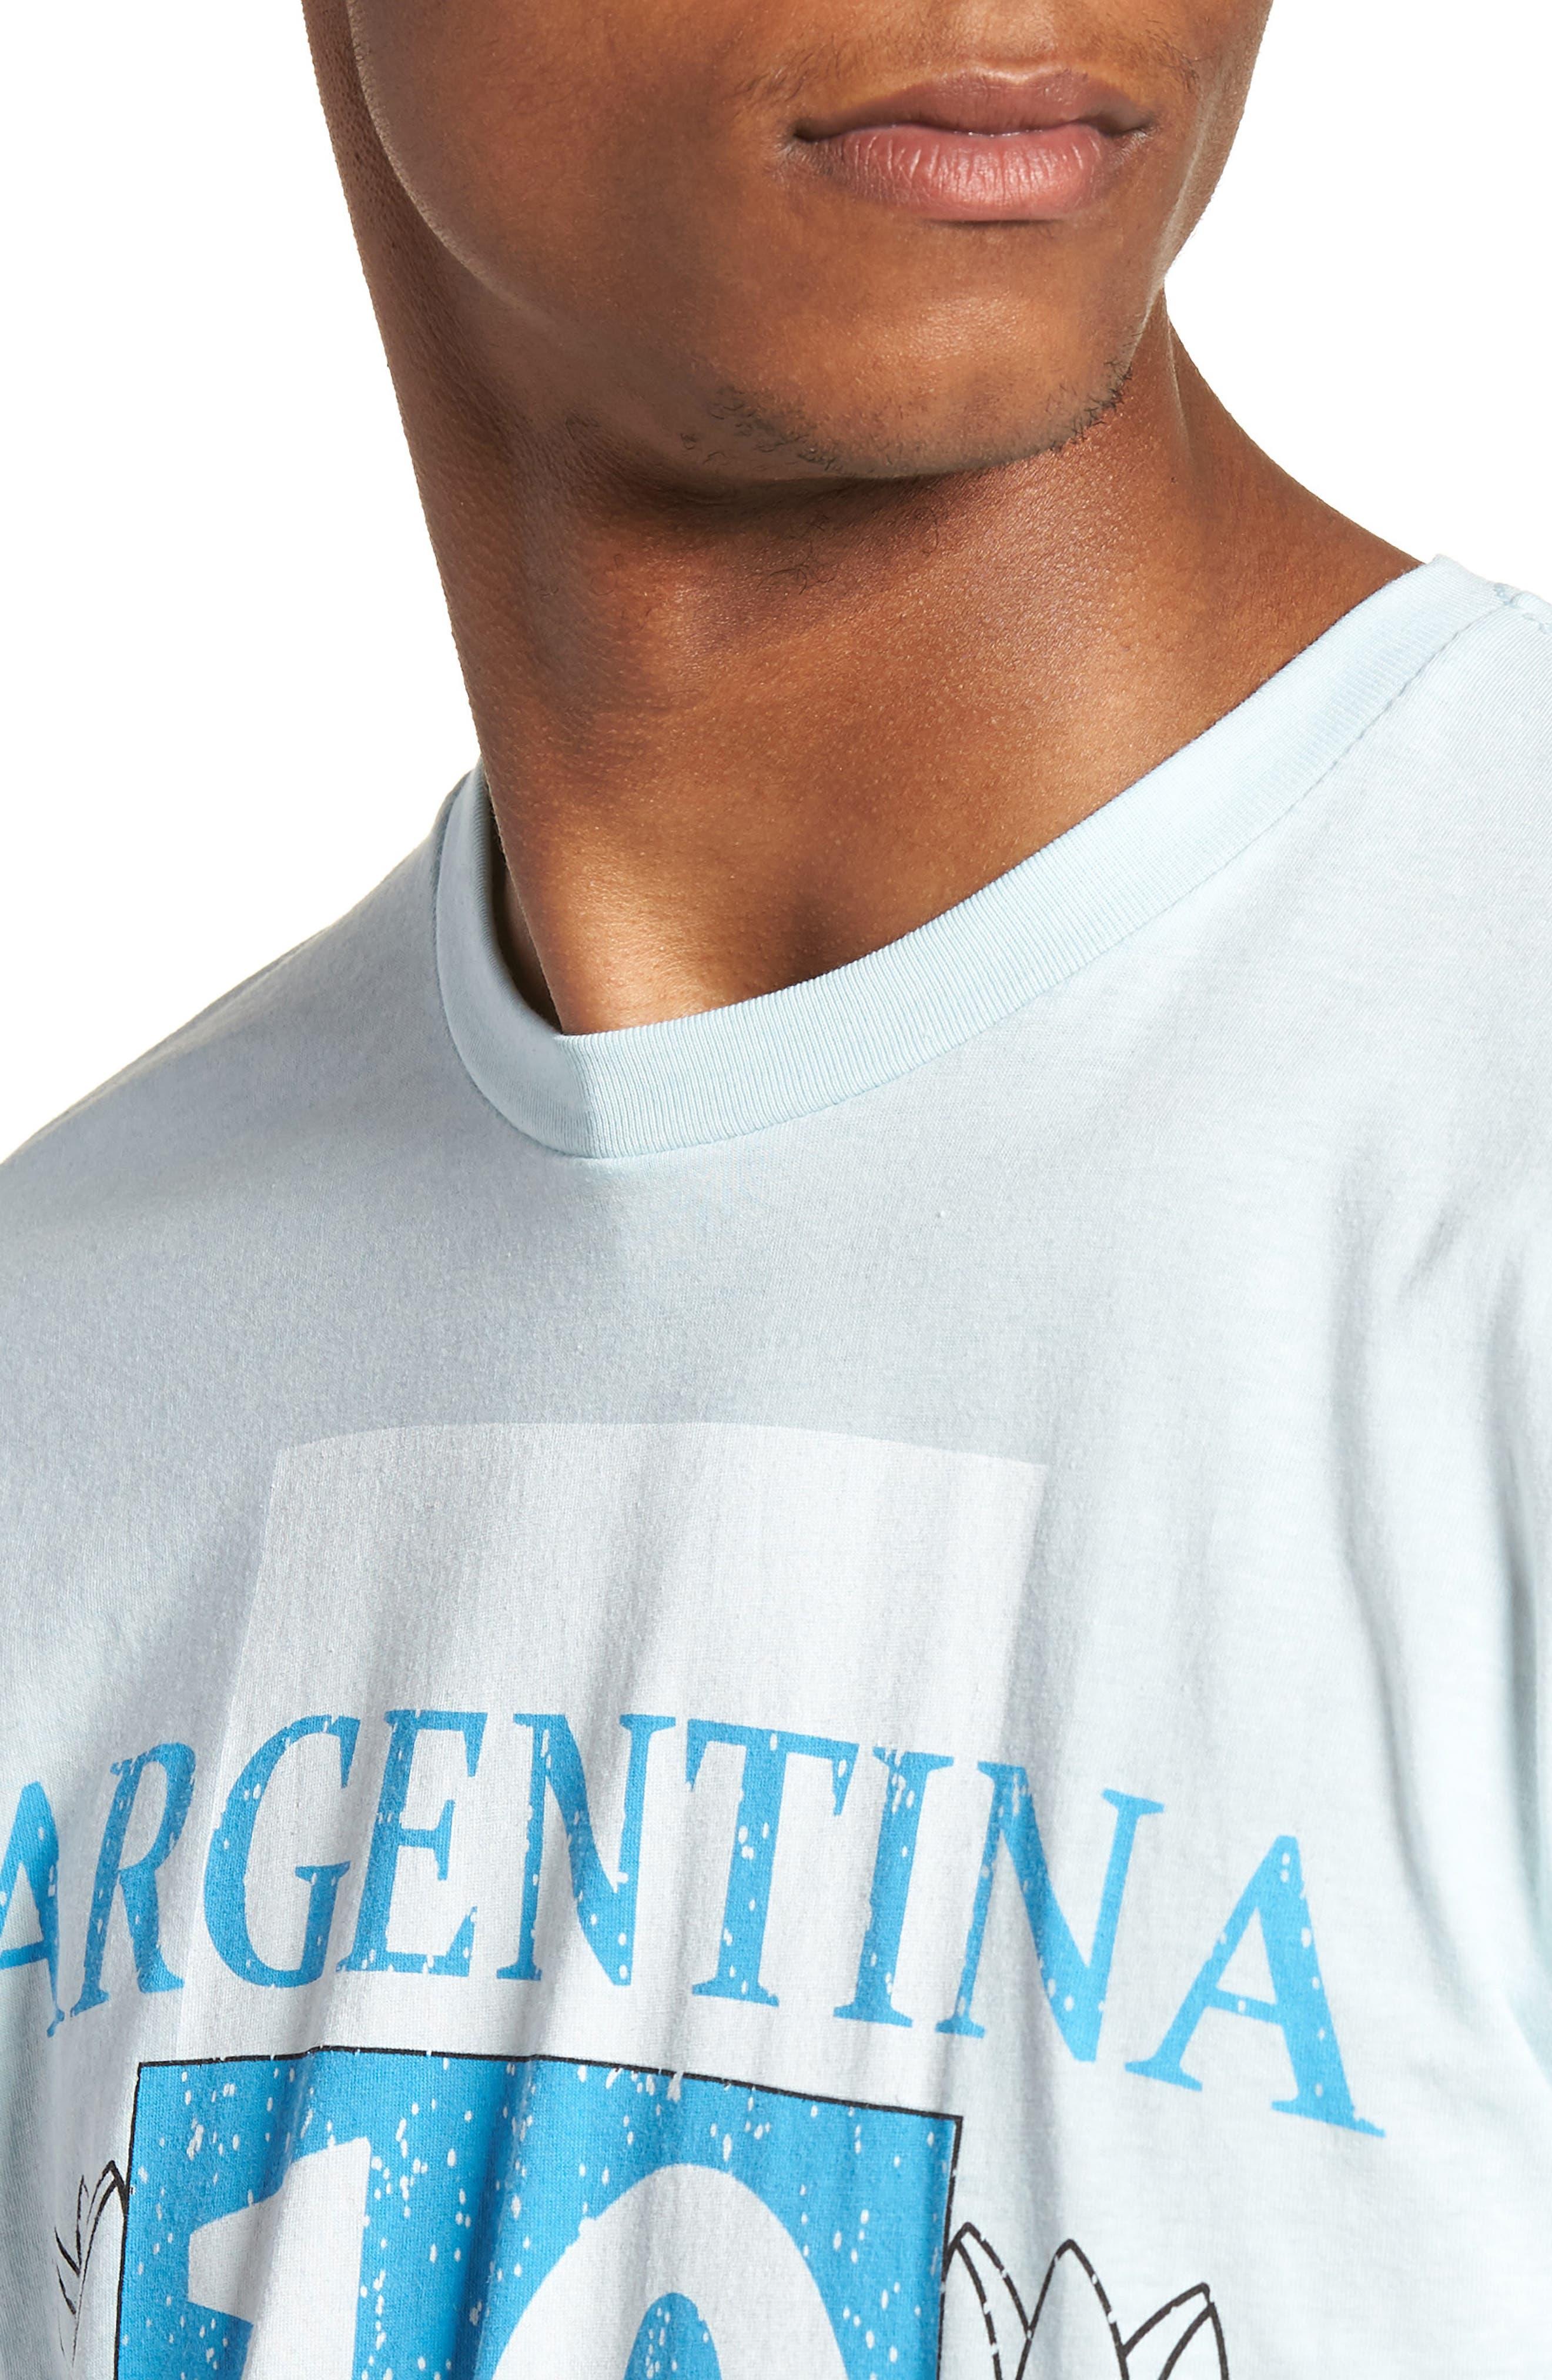 Kintetix Argentina T-Shirt,                             Alternate thumbnail 4, color,                             Sky Blue